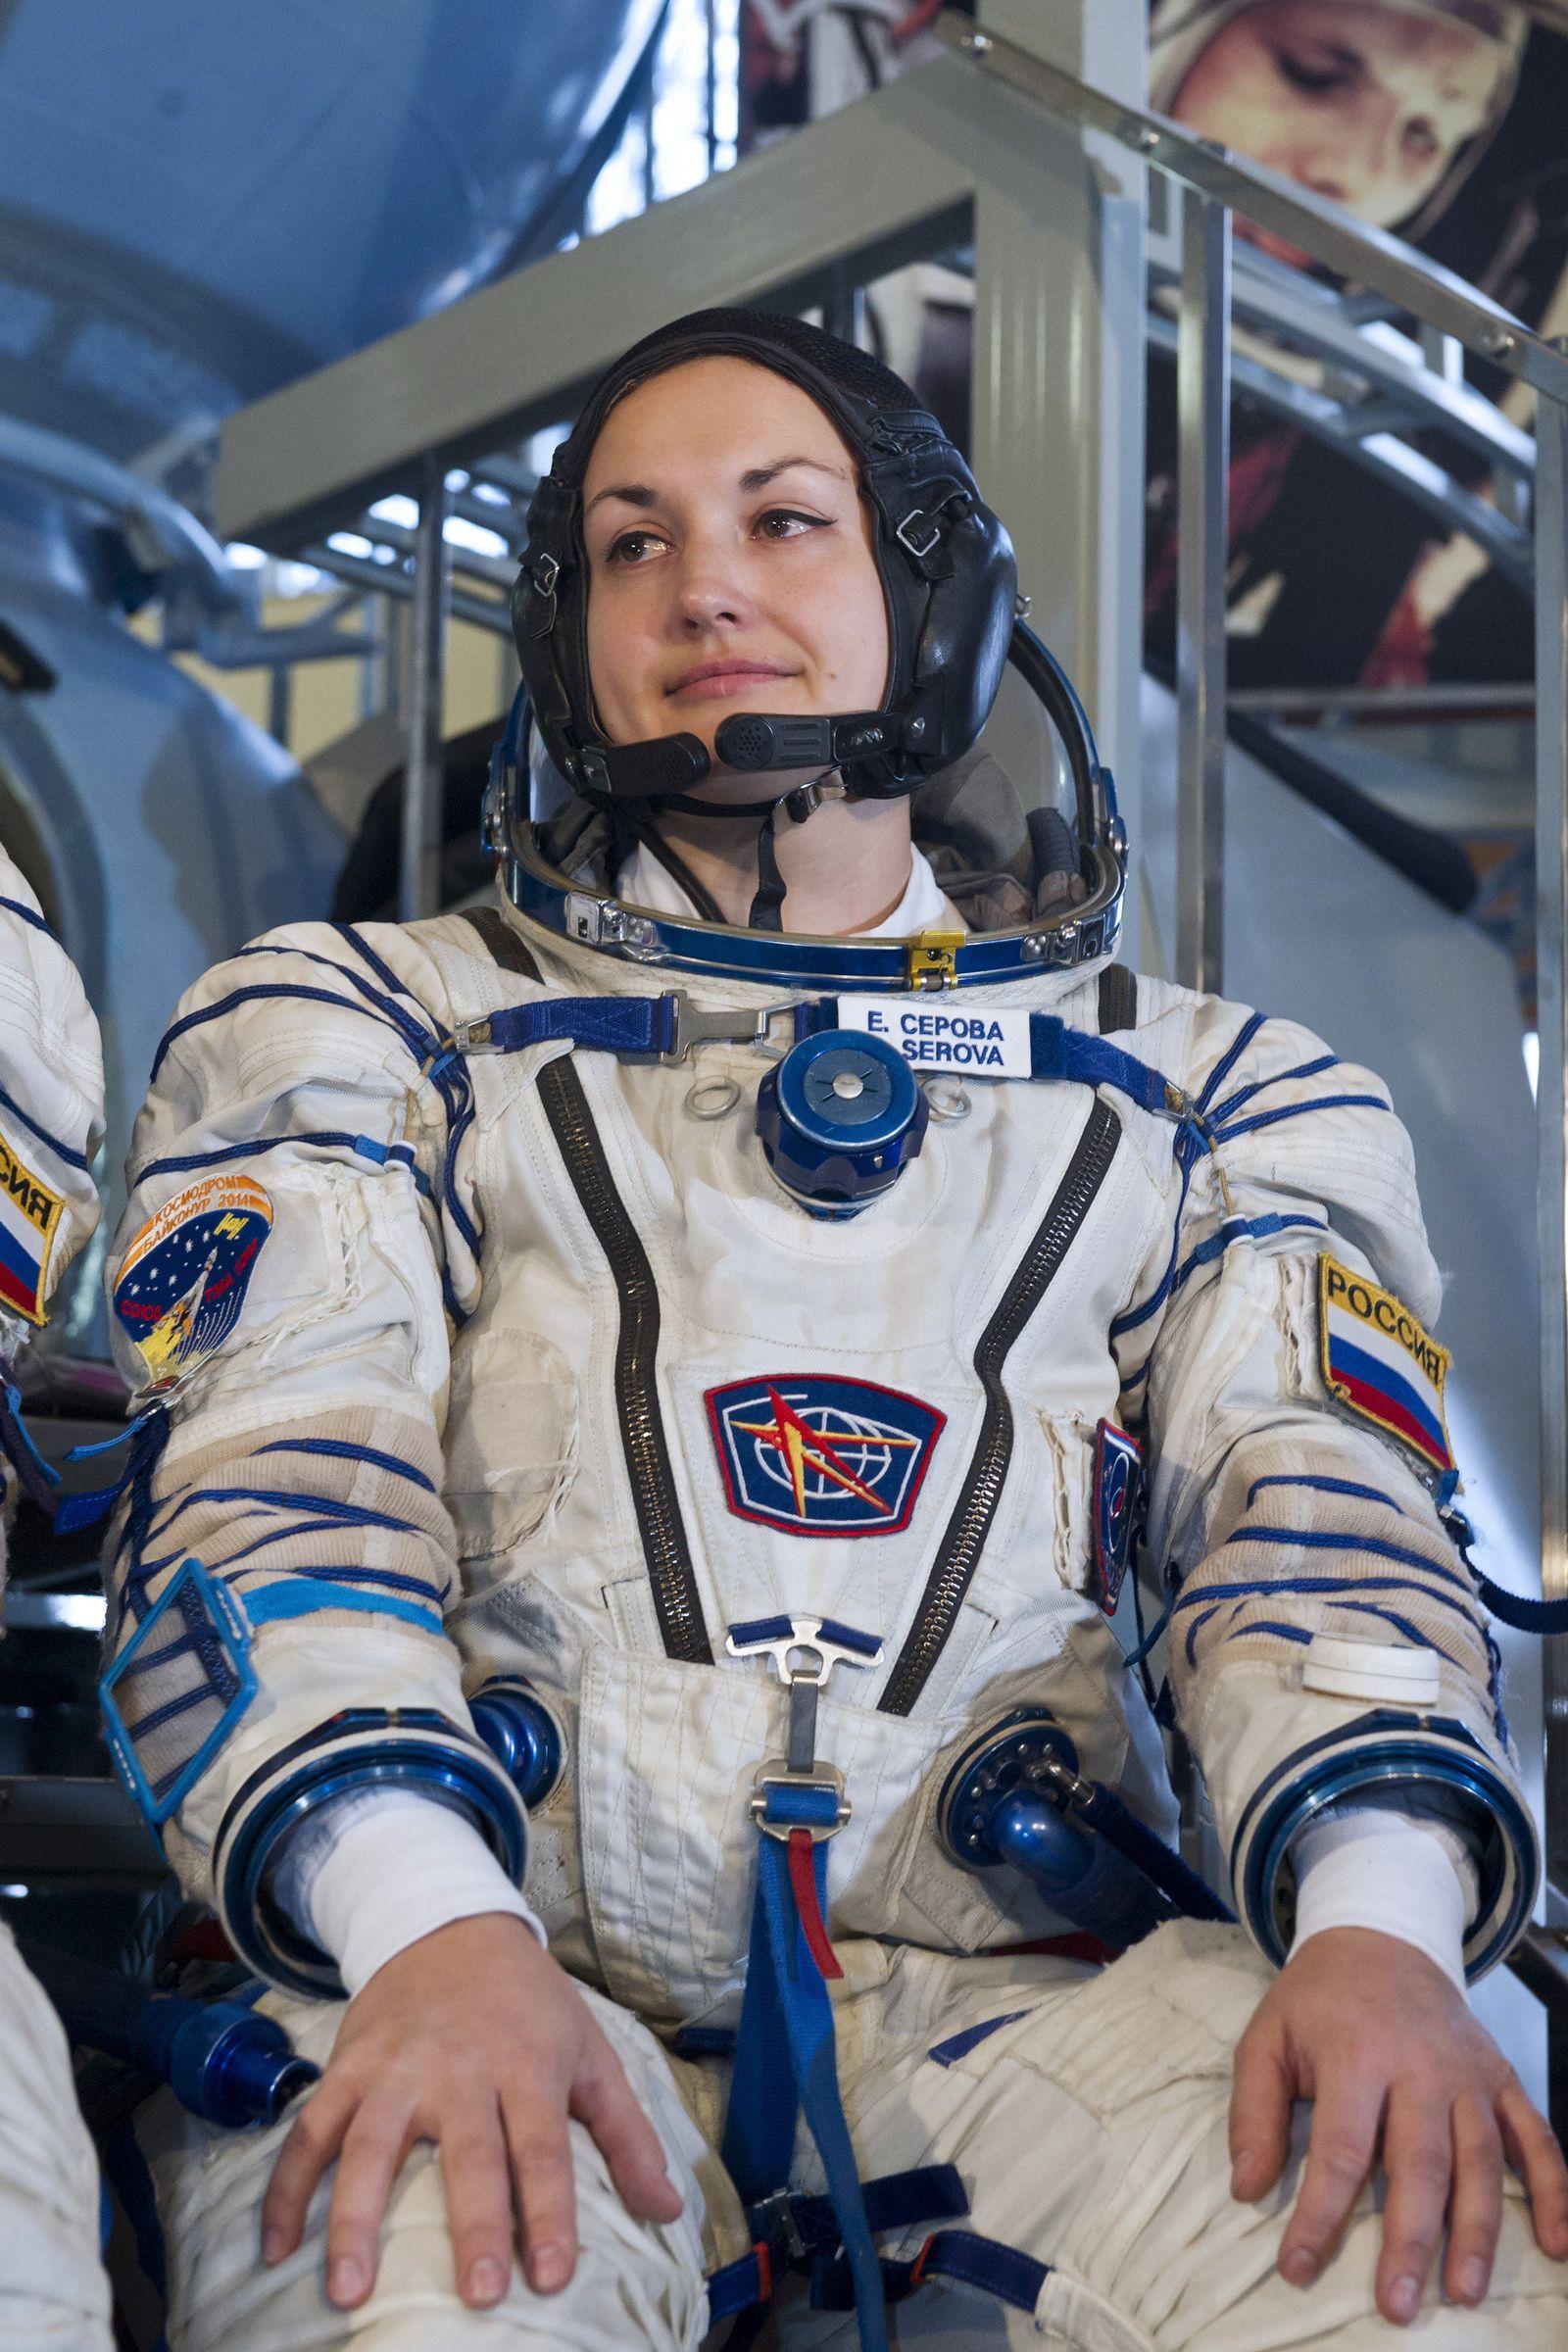 Jelena Serowa / ISS